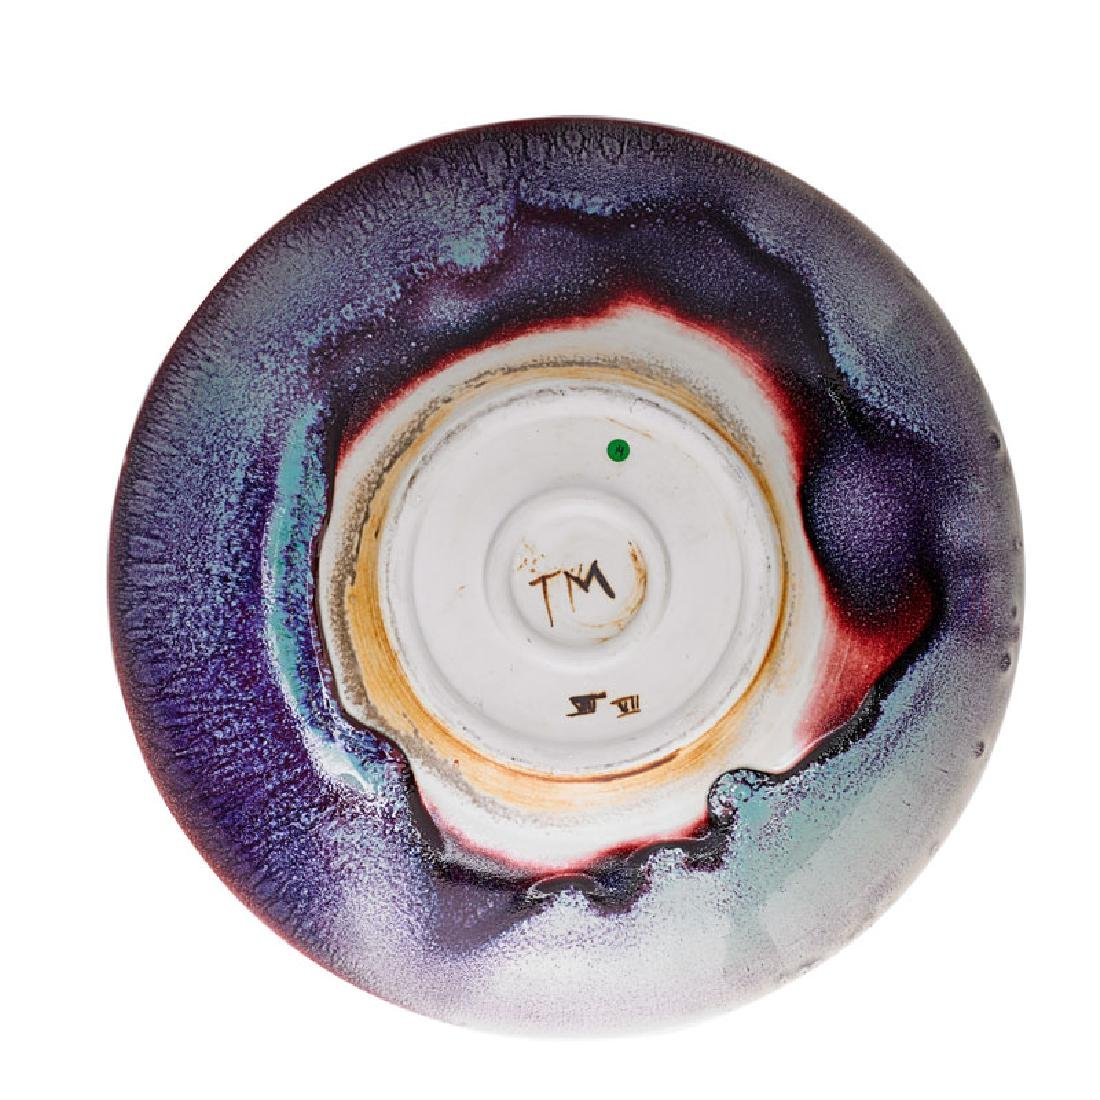 TOINI MUONA Glazed porcelain charger - 3